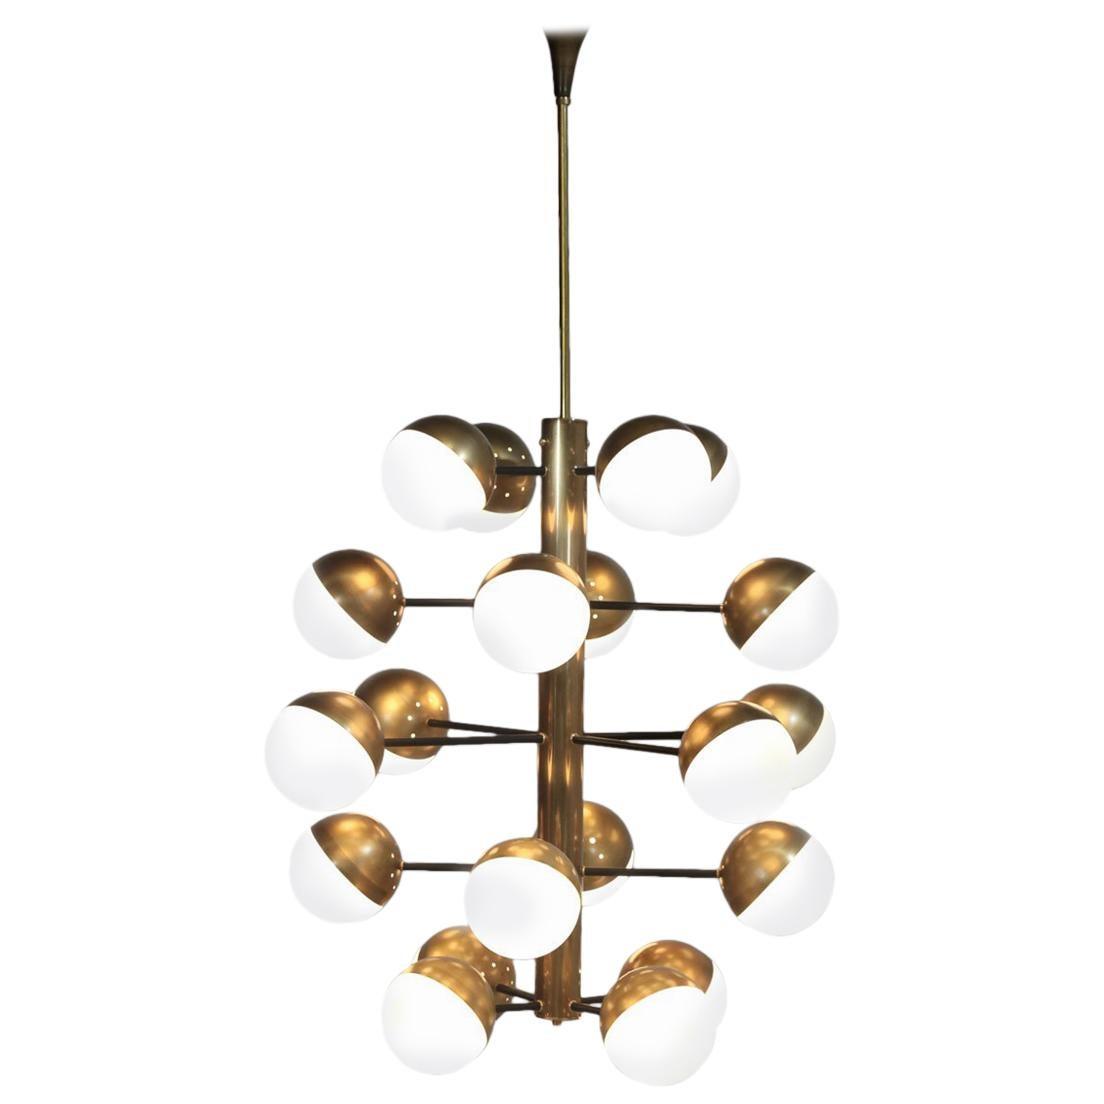 Large Modern Chandelier with 20 Lights, Italian Stilnovo Style